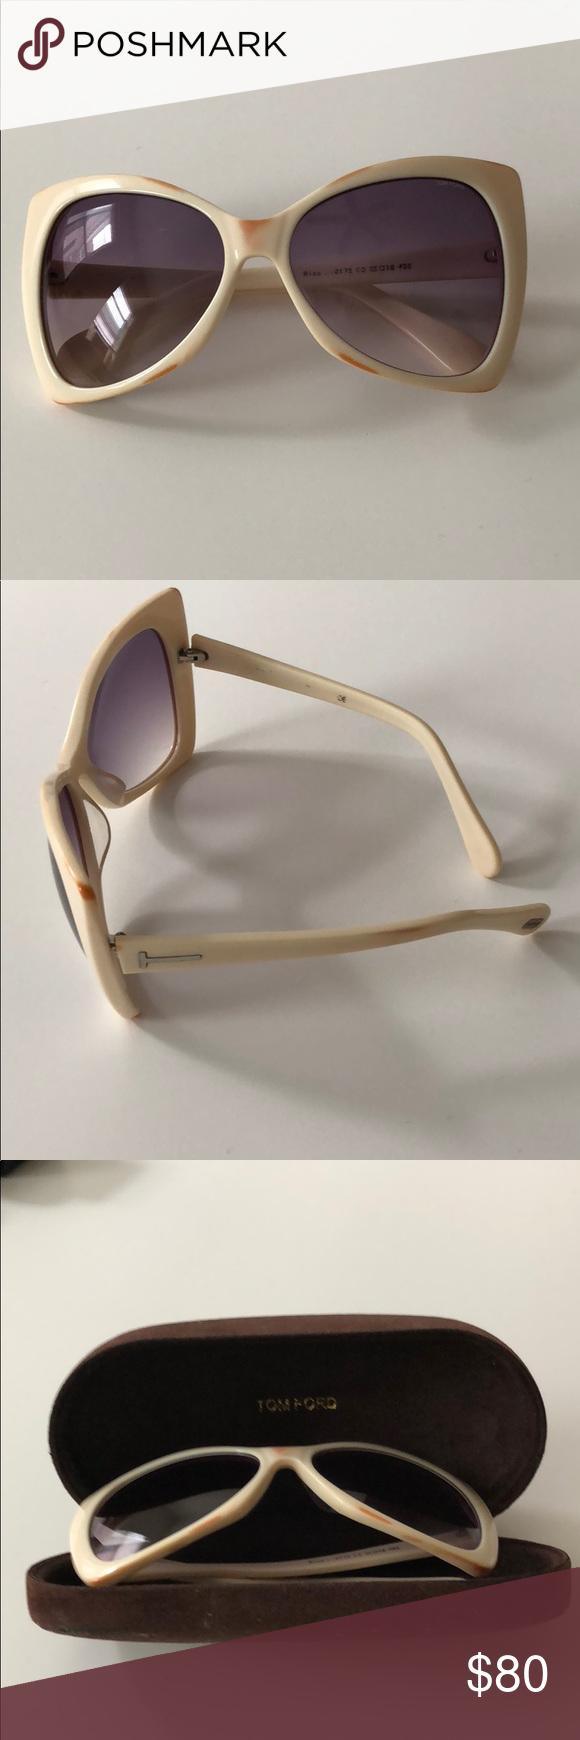 de8a85e4c56 Tom Ford Sunglasses Barely used Tom Ford Accessories Sunglasses ...